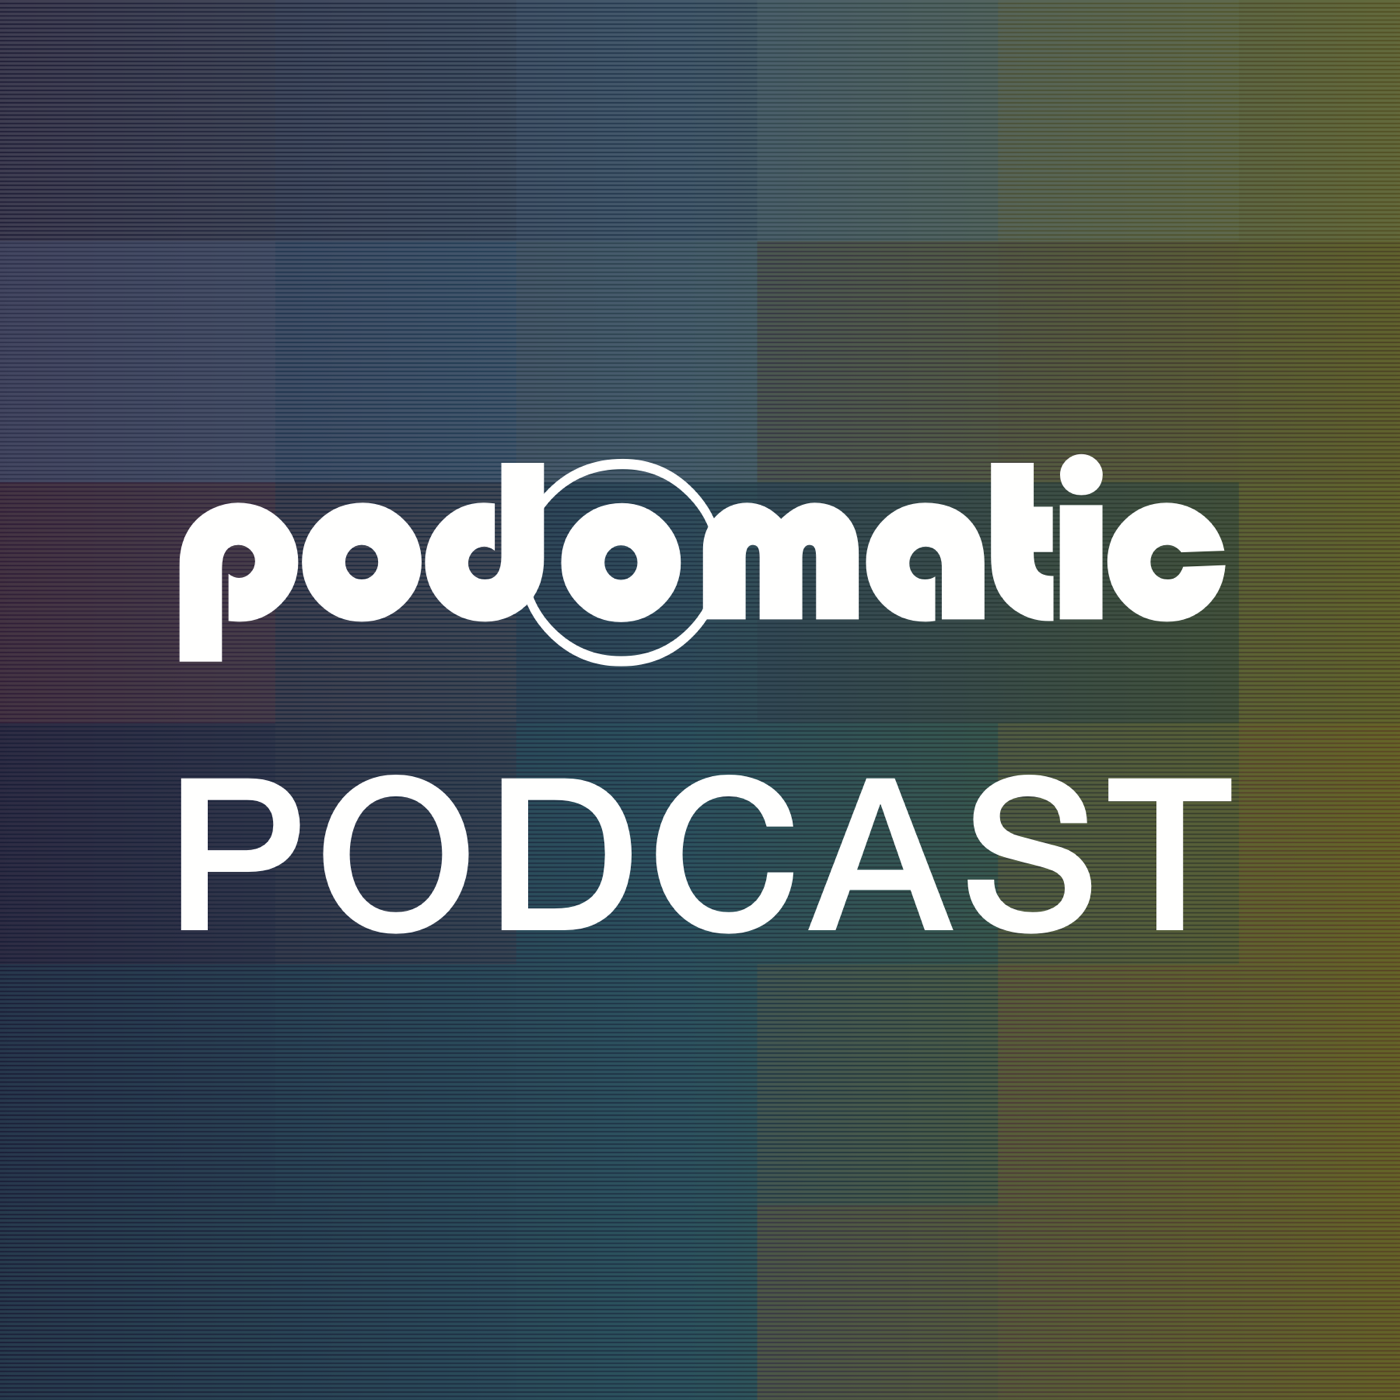 The Mark Gorman Audio Podcast